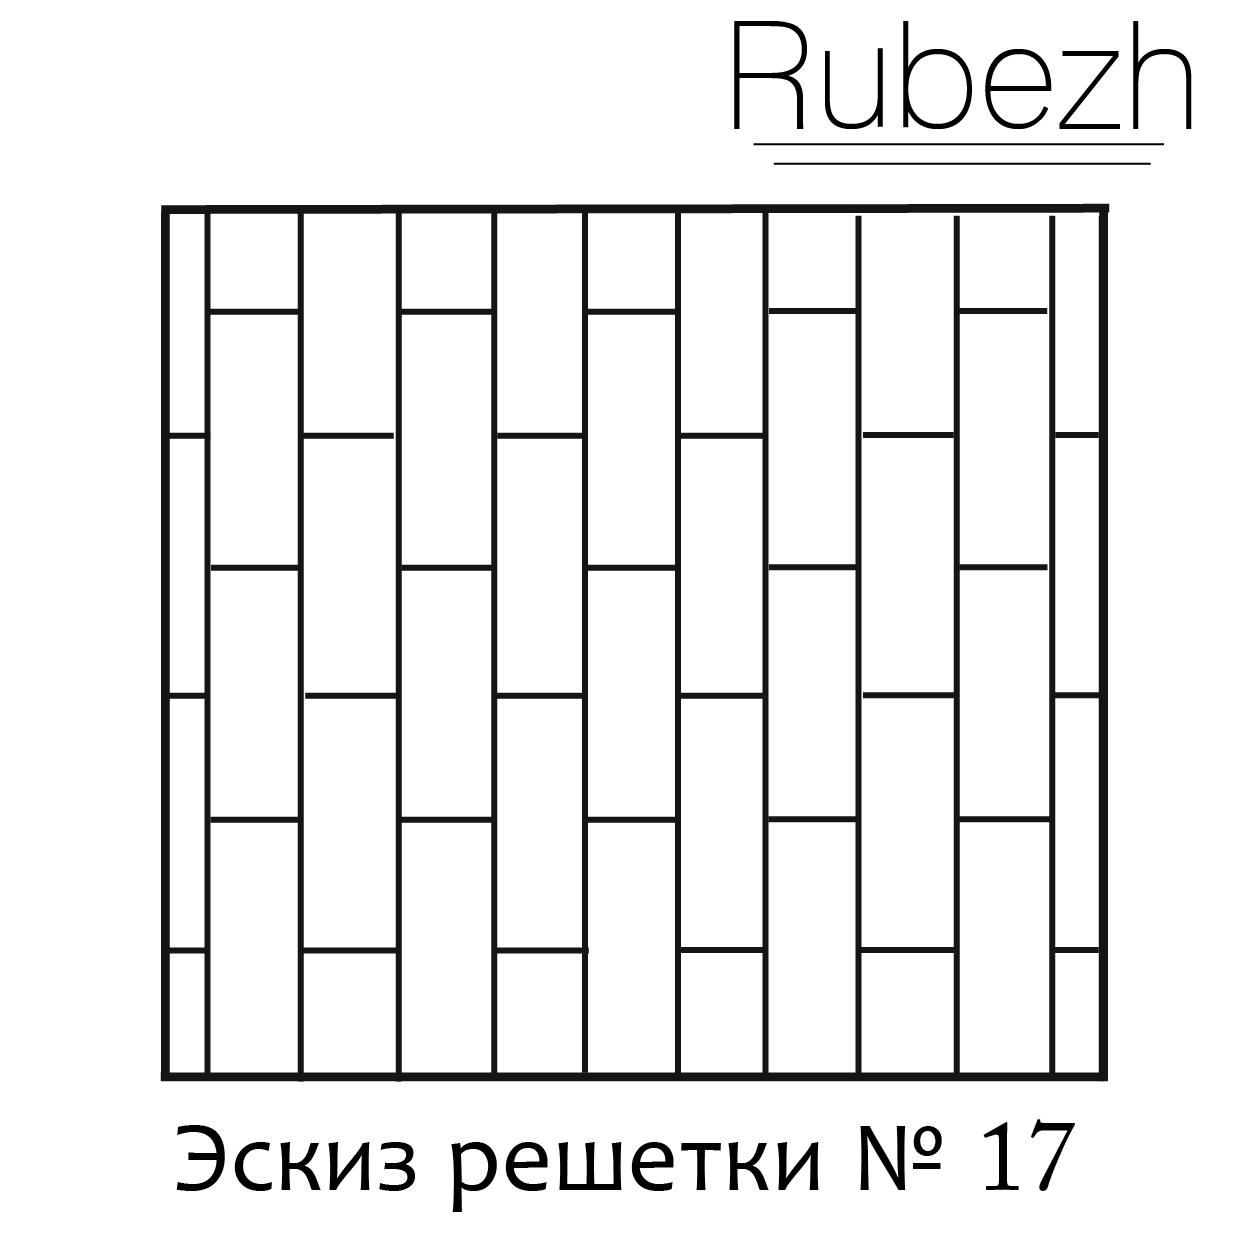 Эскиз решетки № 17